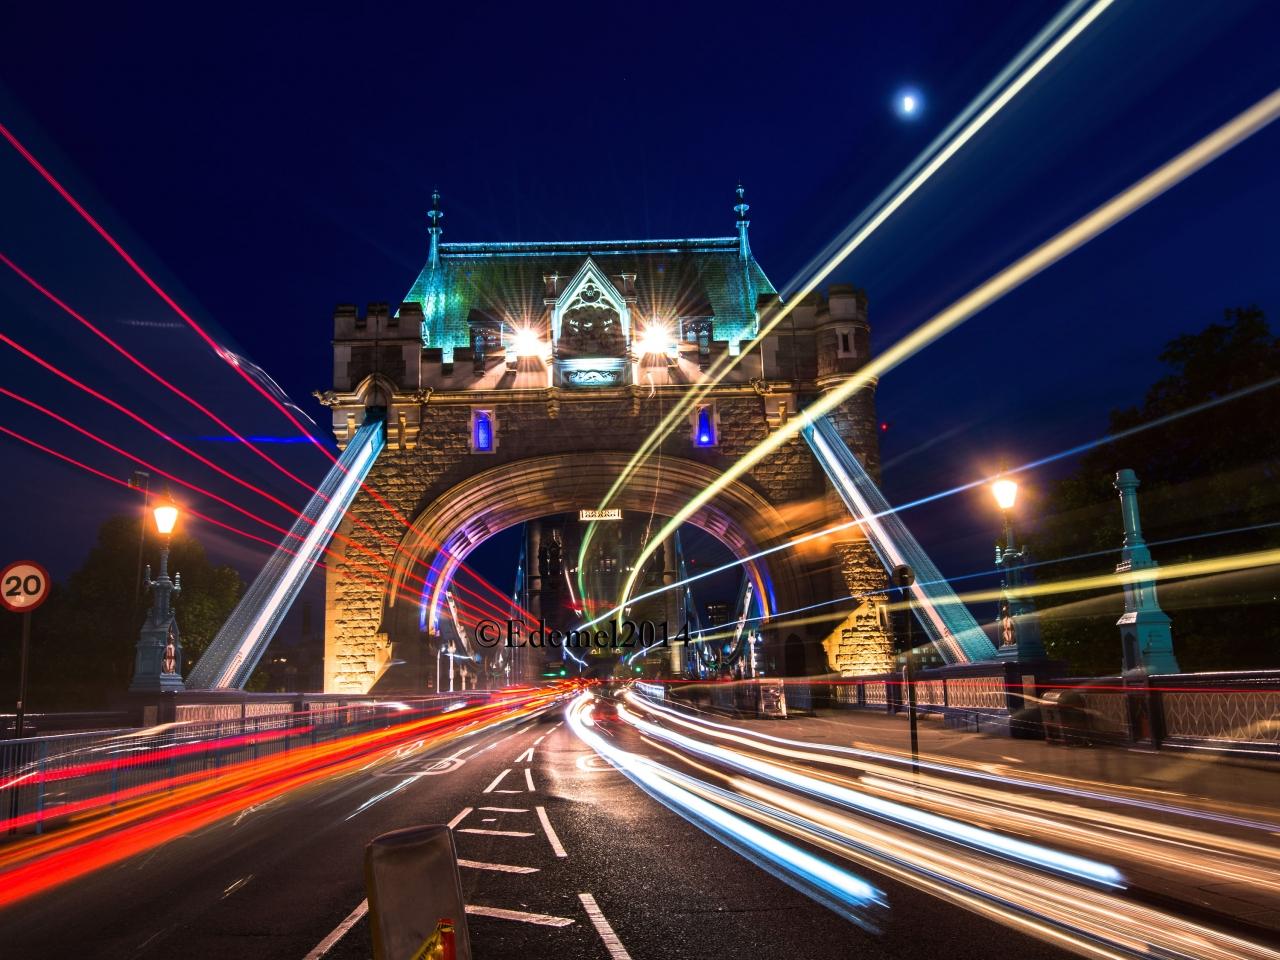 Puente en London - 1280x960